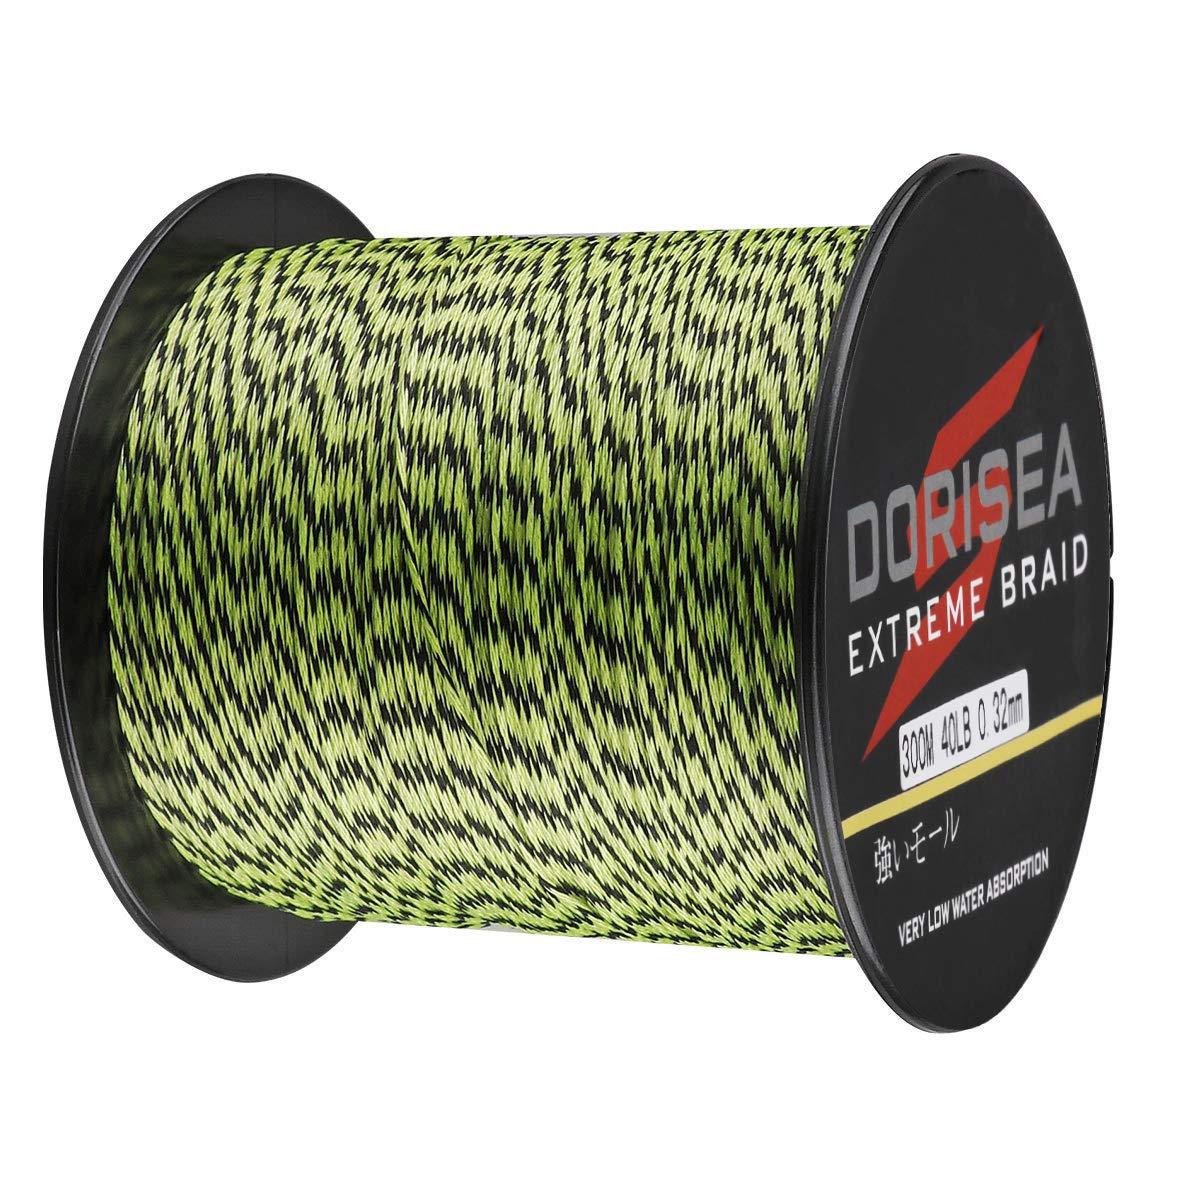 Dorisea Extreme Braid 100% Pe Multi-Color(Fluorescent Green&Black) Braided Fishing Line 109Yards-2187Yards 6-550Lb Test Fishing Wire Fishing String Superline